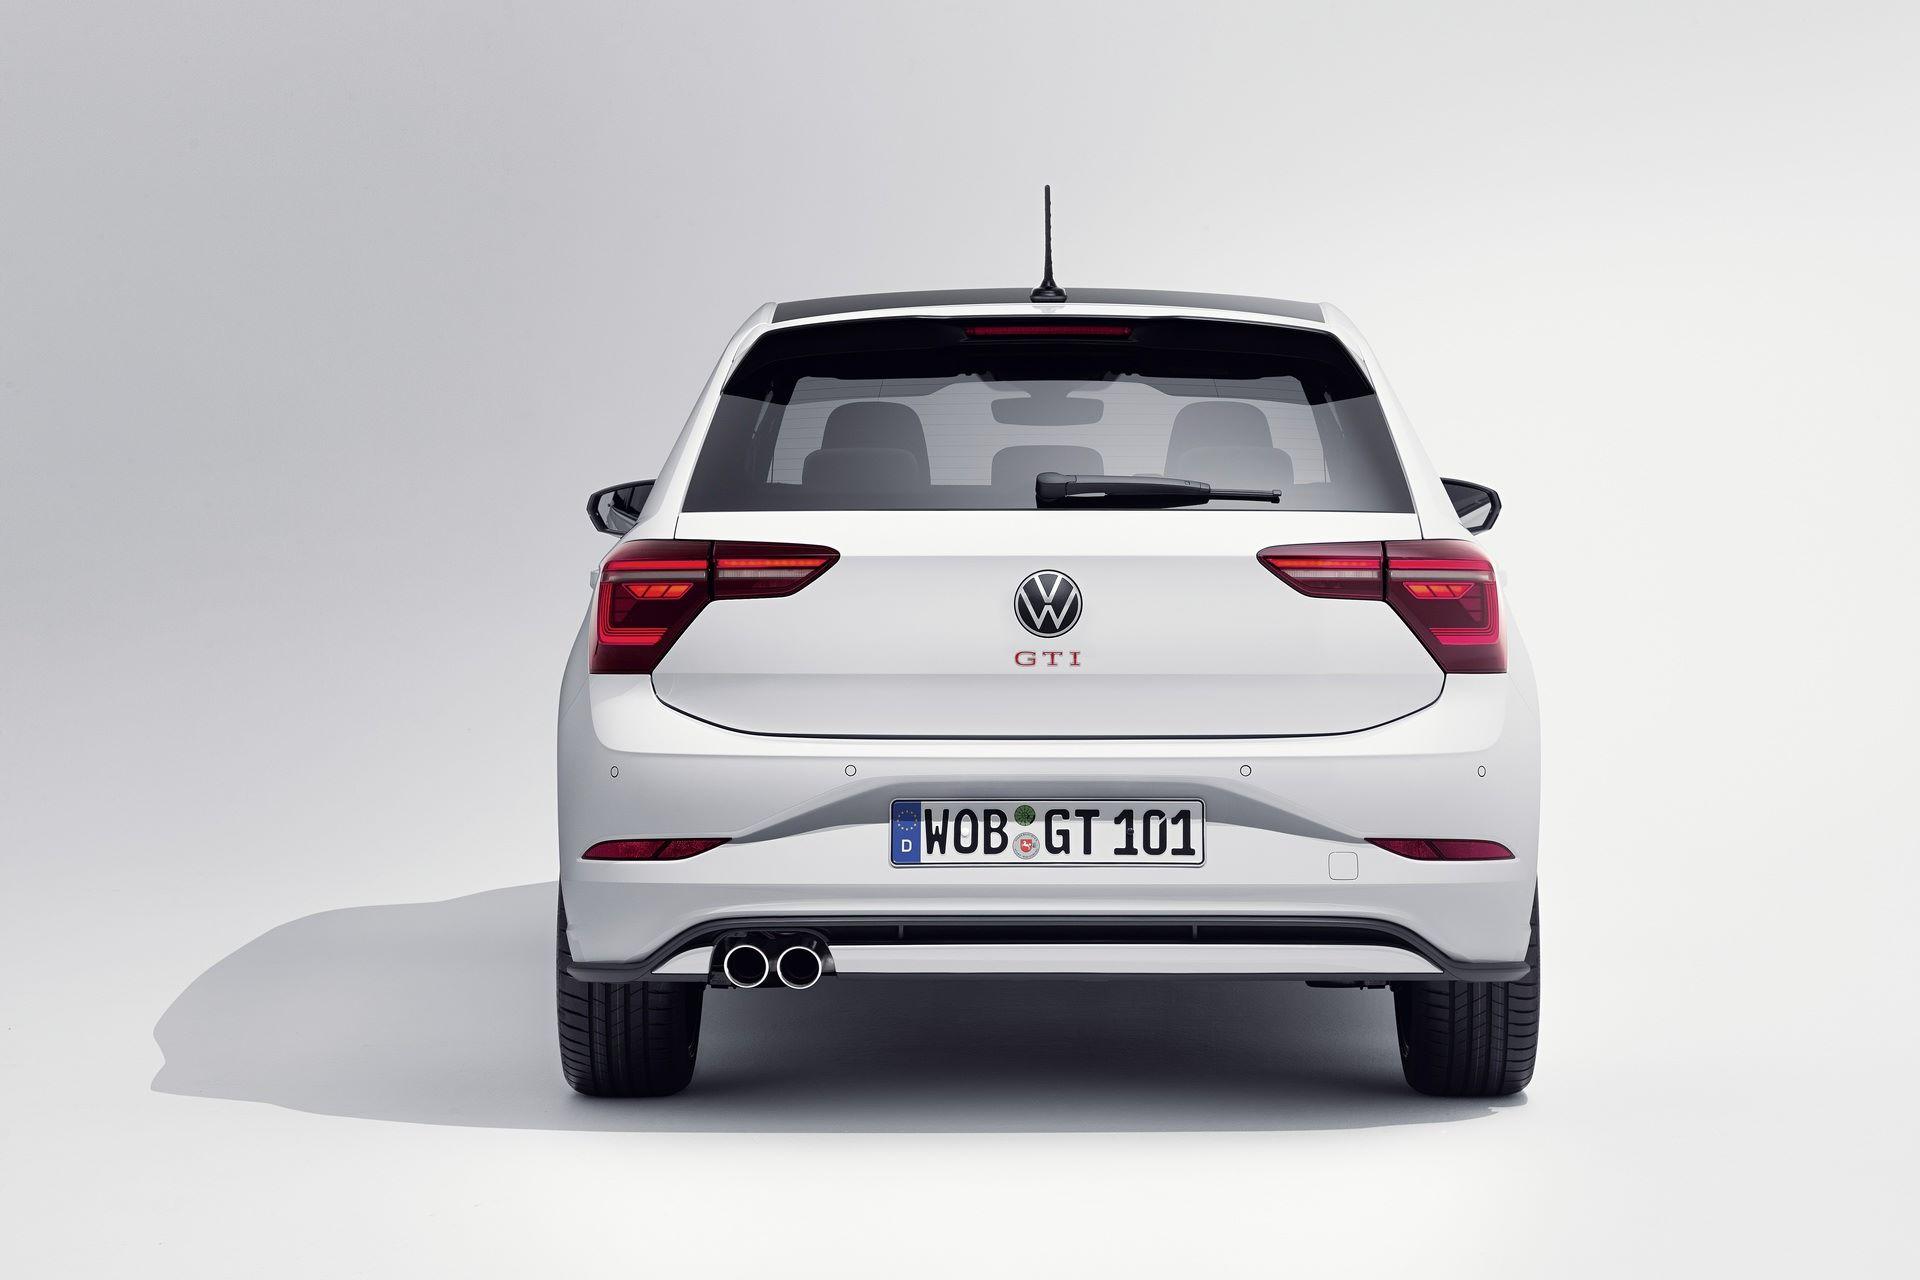 VW-Polo-GTI-facelift-4